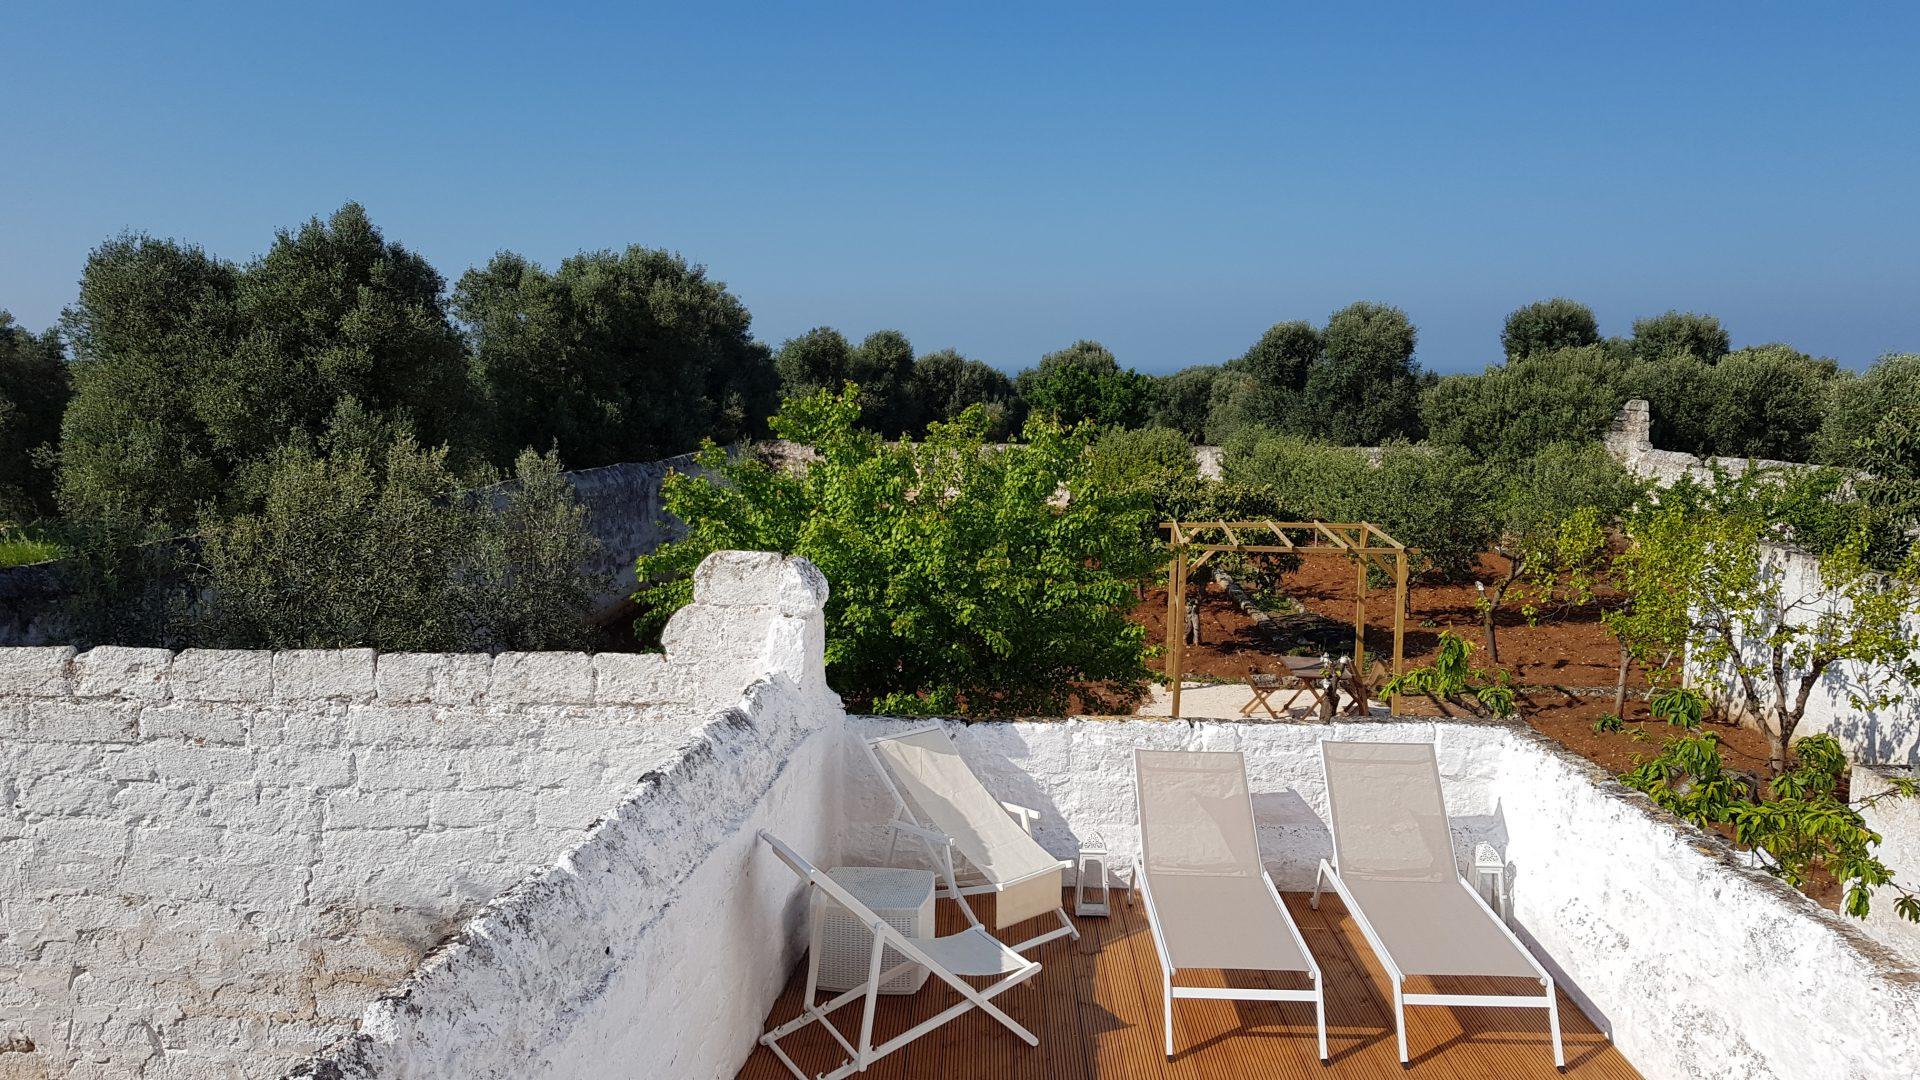 Swimming pool deck, walls and olive groves at Pool at Masseria Bellavista historic holiday vacation rental villa in ostuni puglia seaview